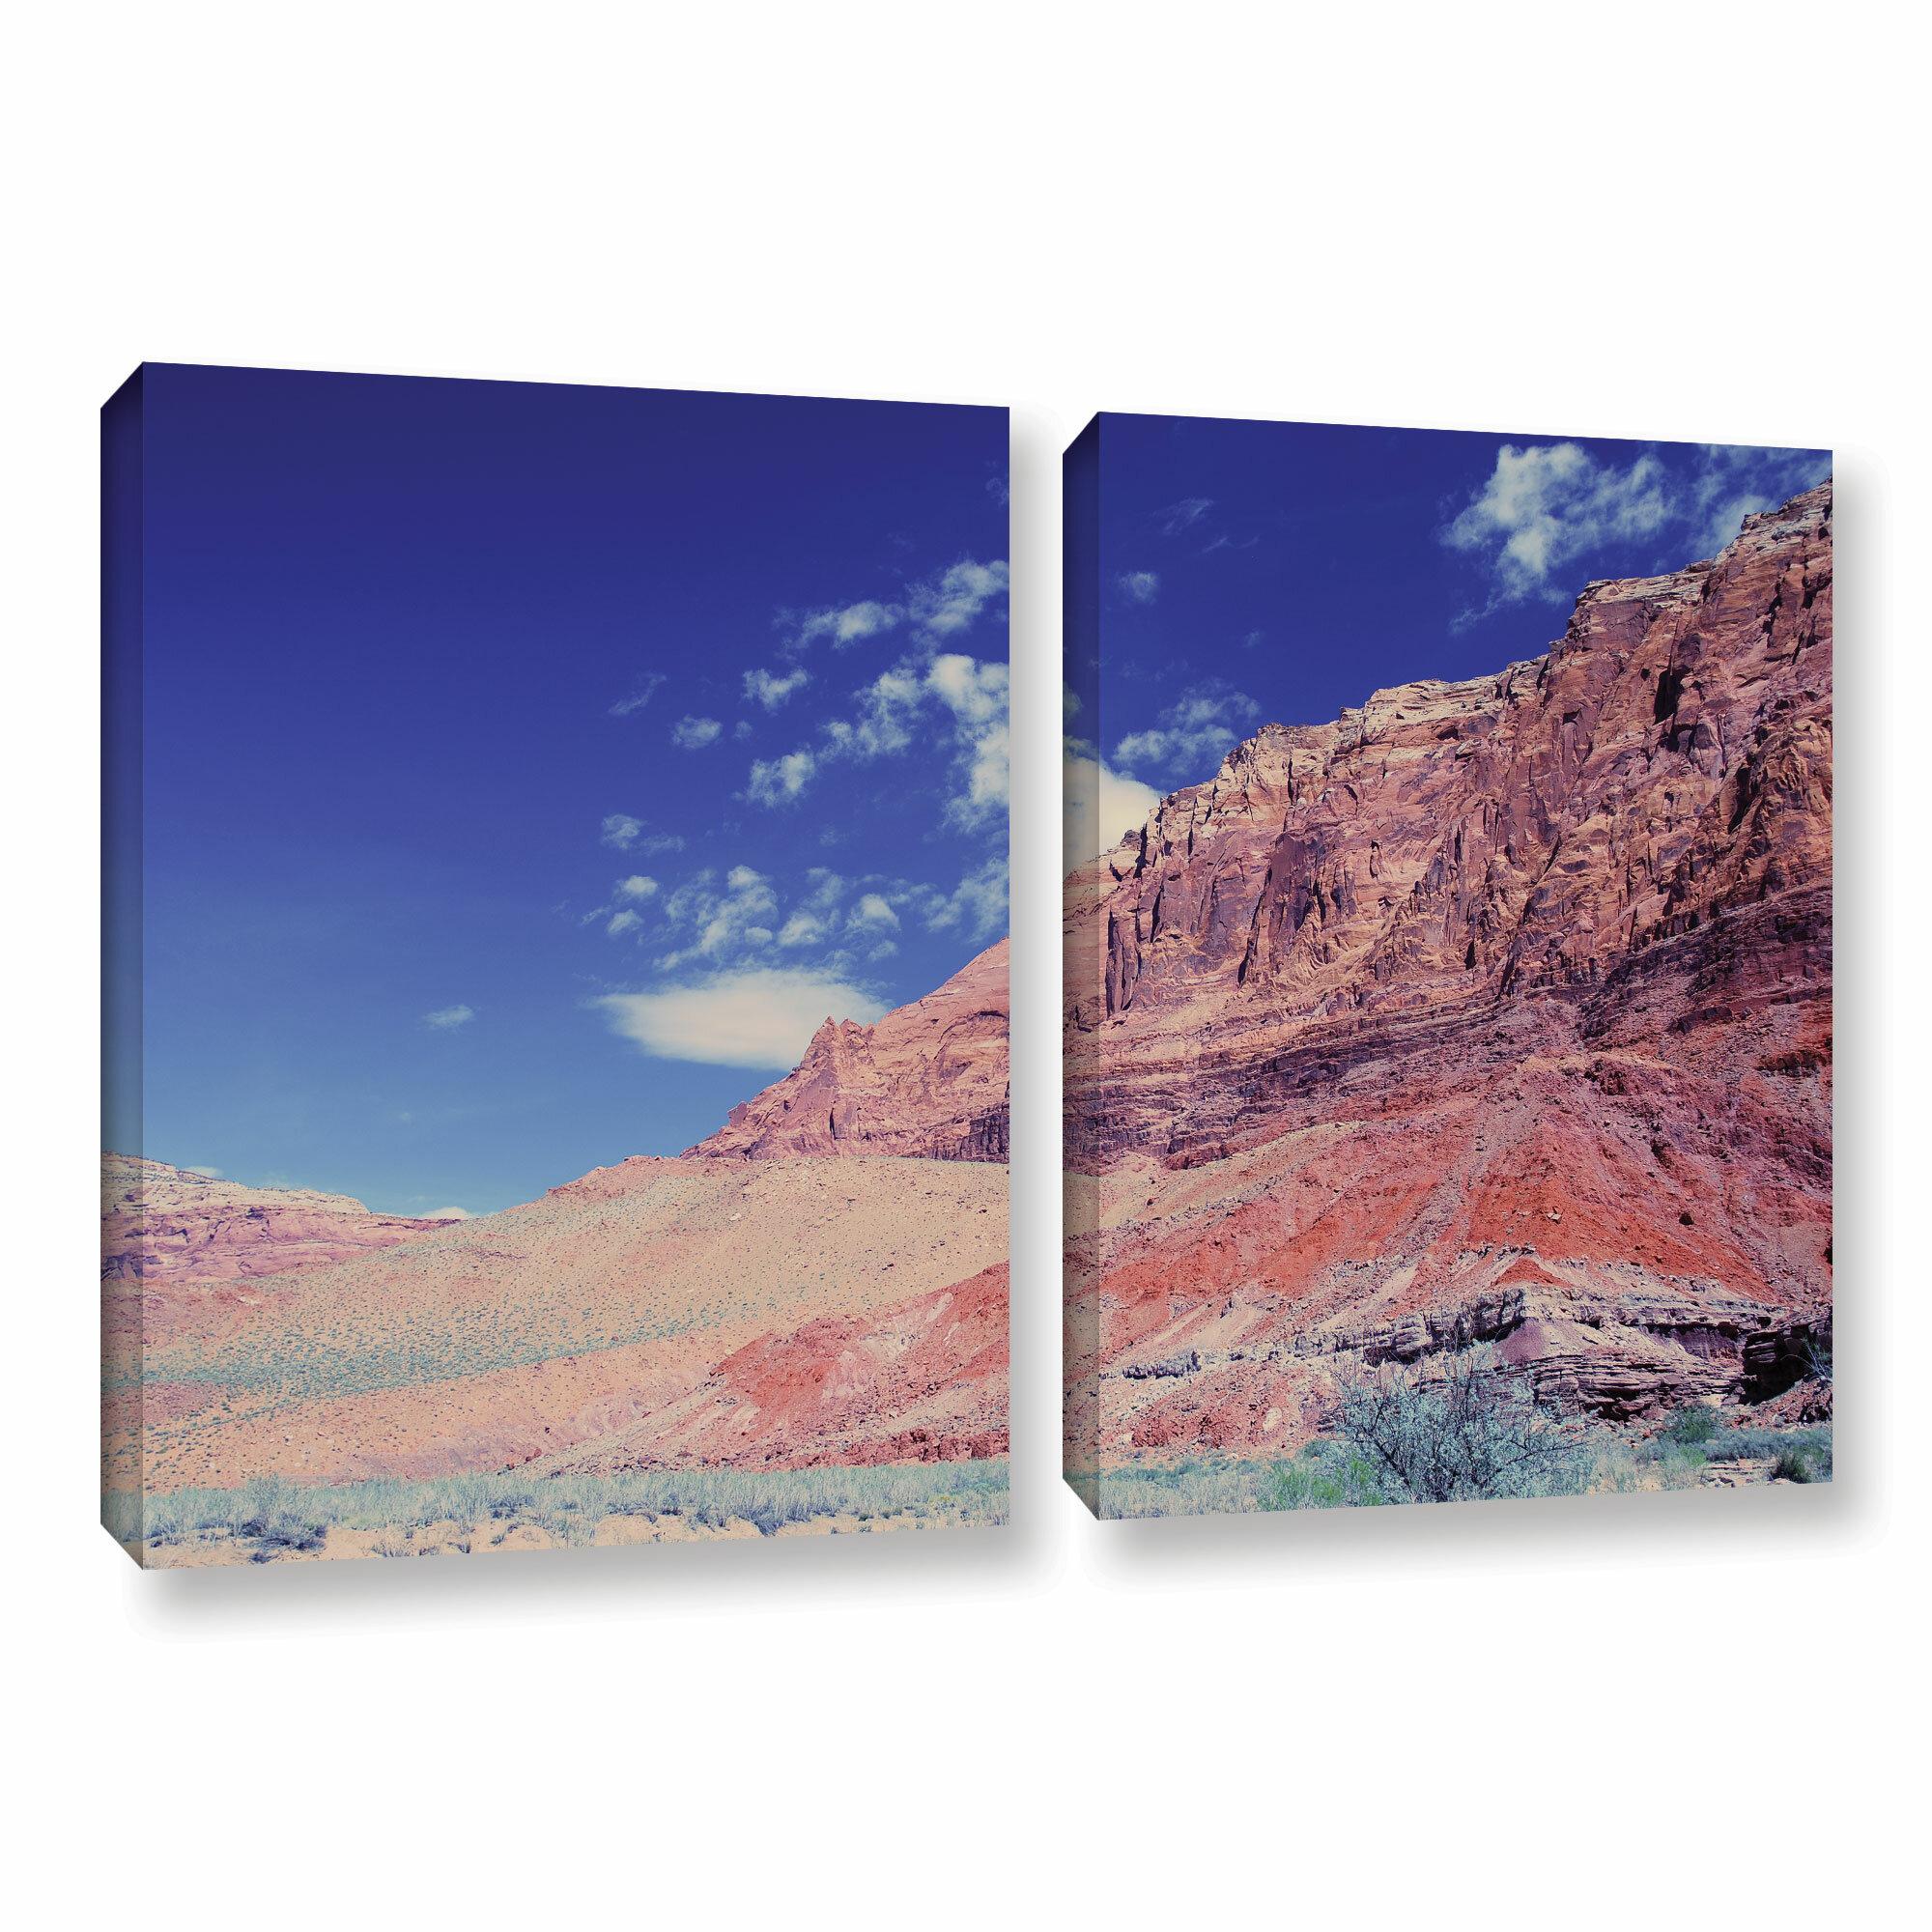 ArtWall Gene Fousts Joyride 4 Piece Gallery-Wrapped Canvas Set 36 x 48